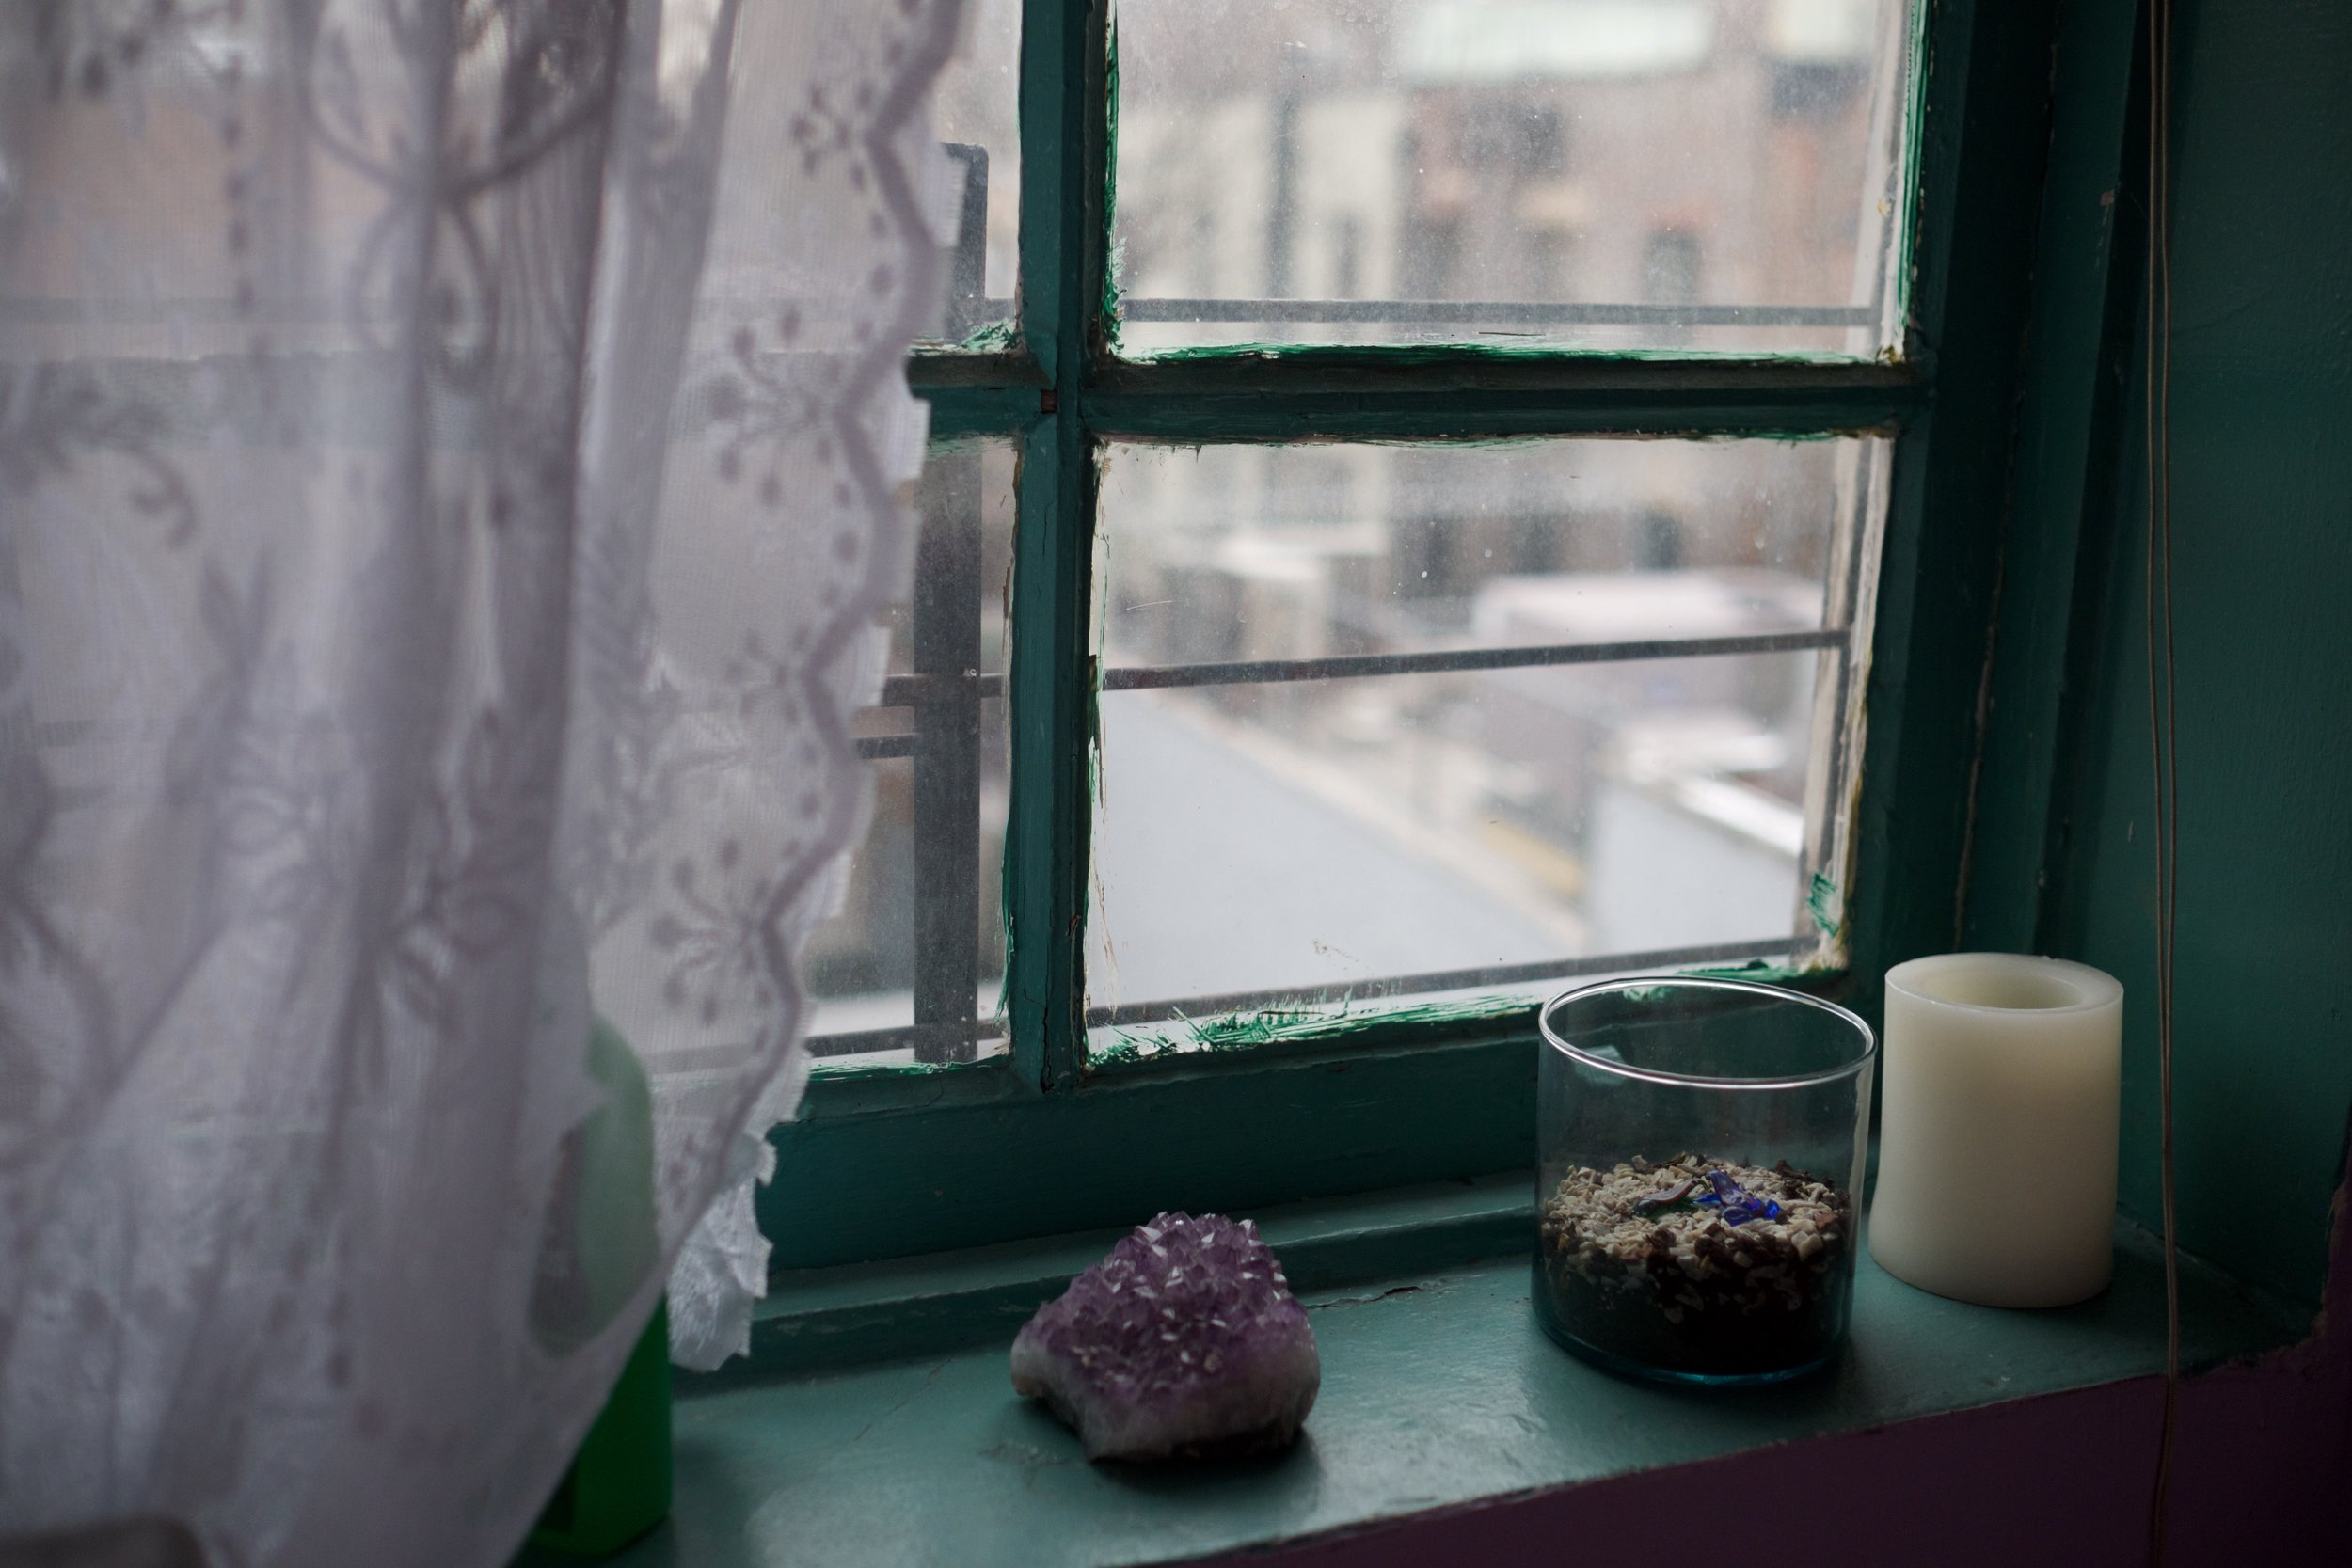 Karen's bedroom at the homeless shelter, six months after her arrival. East Village, NY (December 17, 2017)